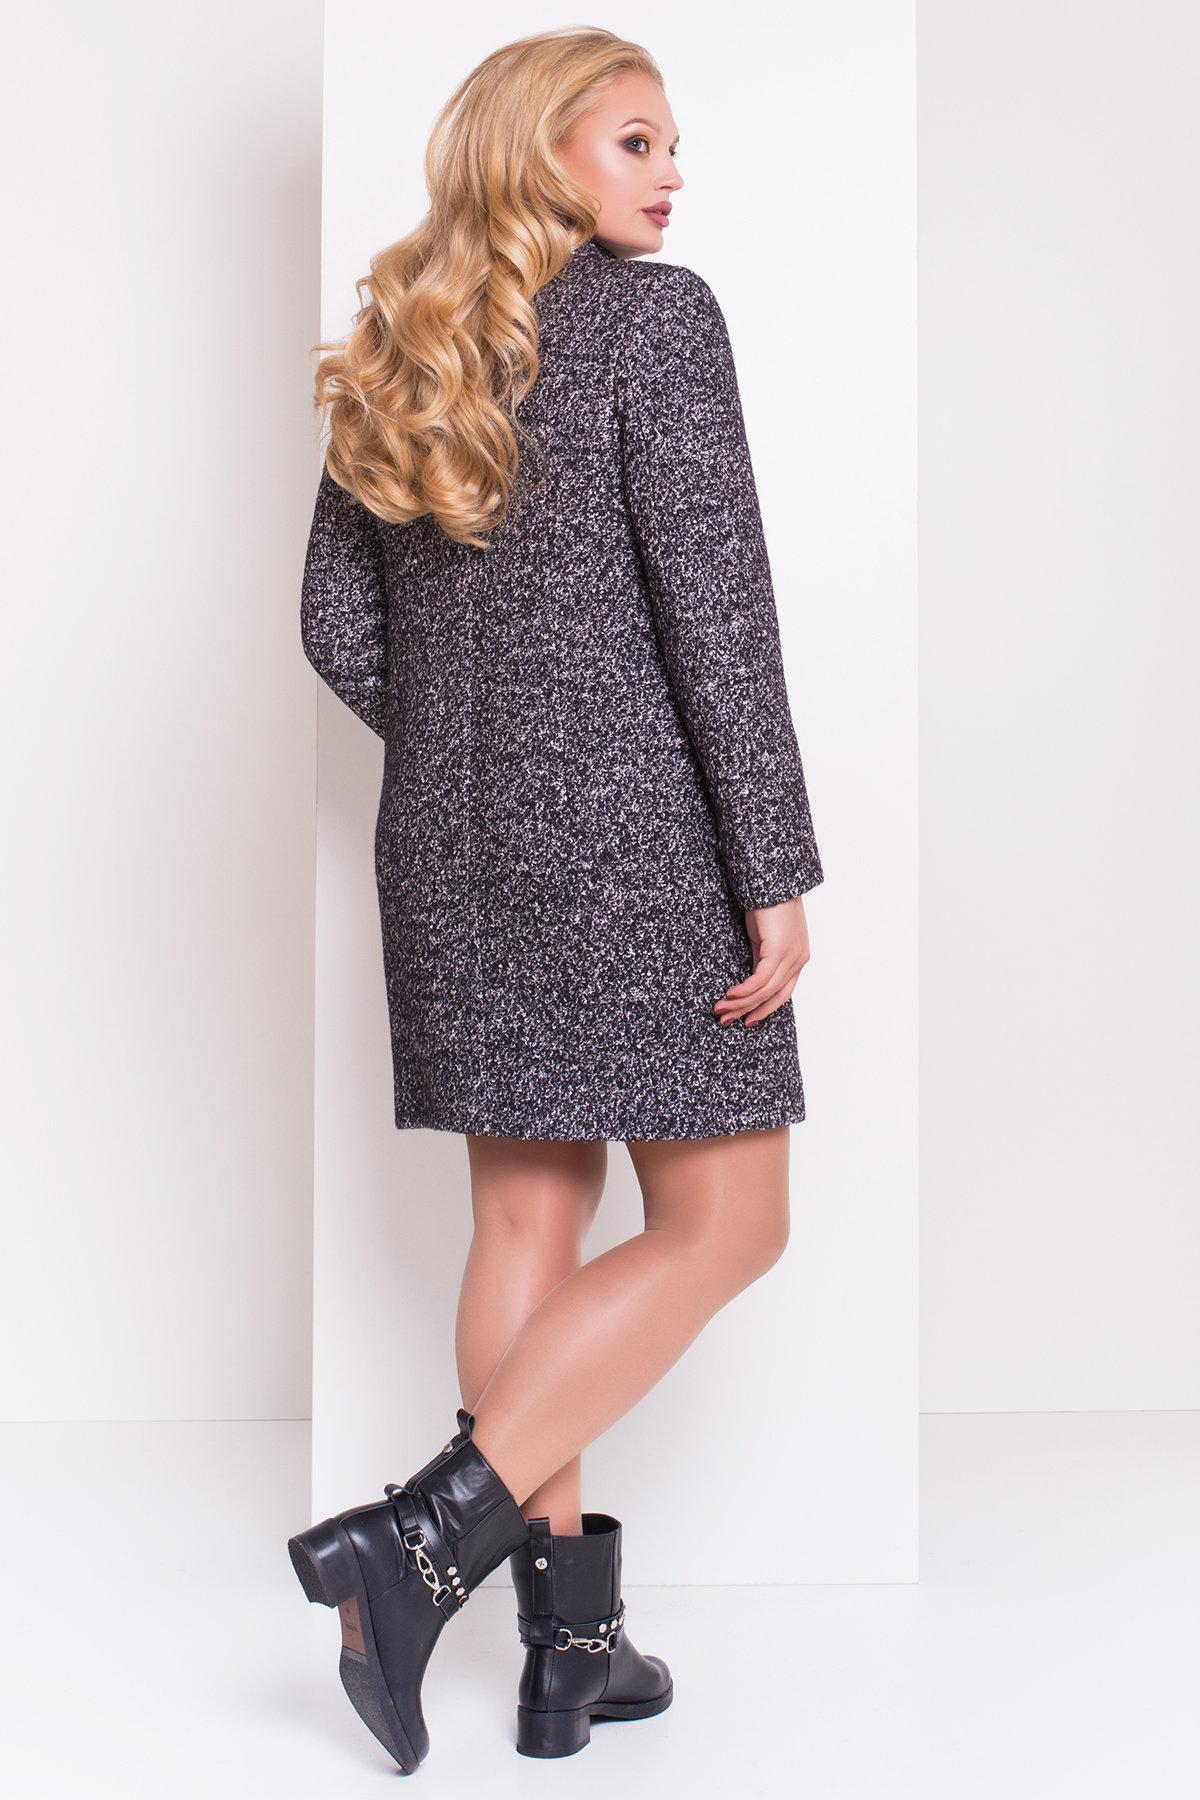 Пальто Donna зима Фортуна 3683 Цвет: Черный/серый